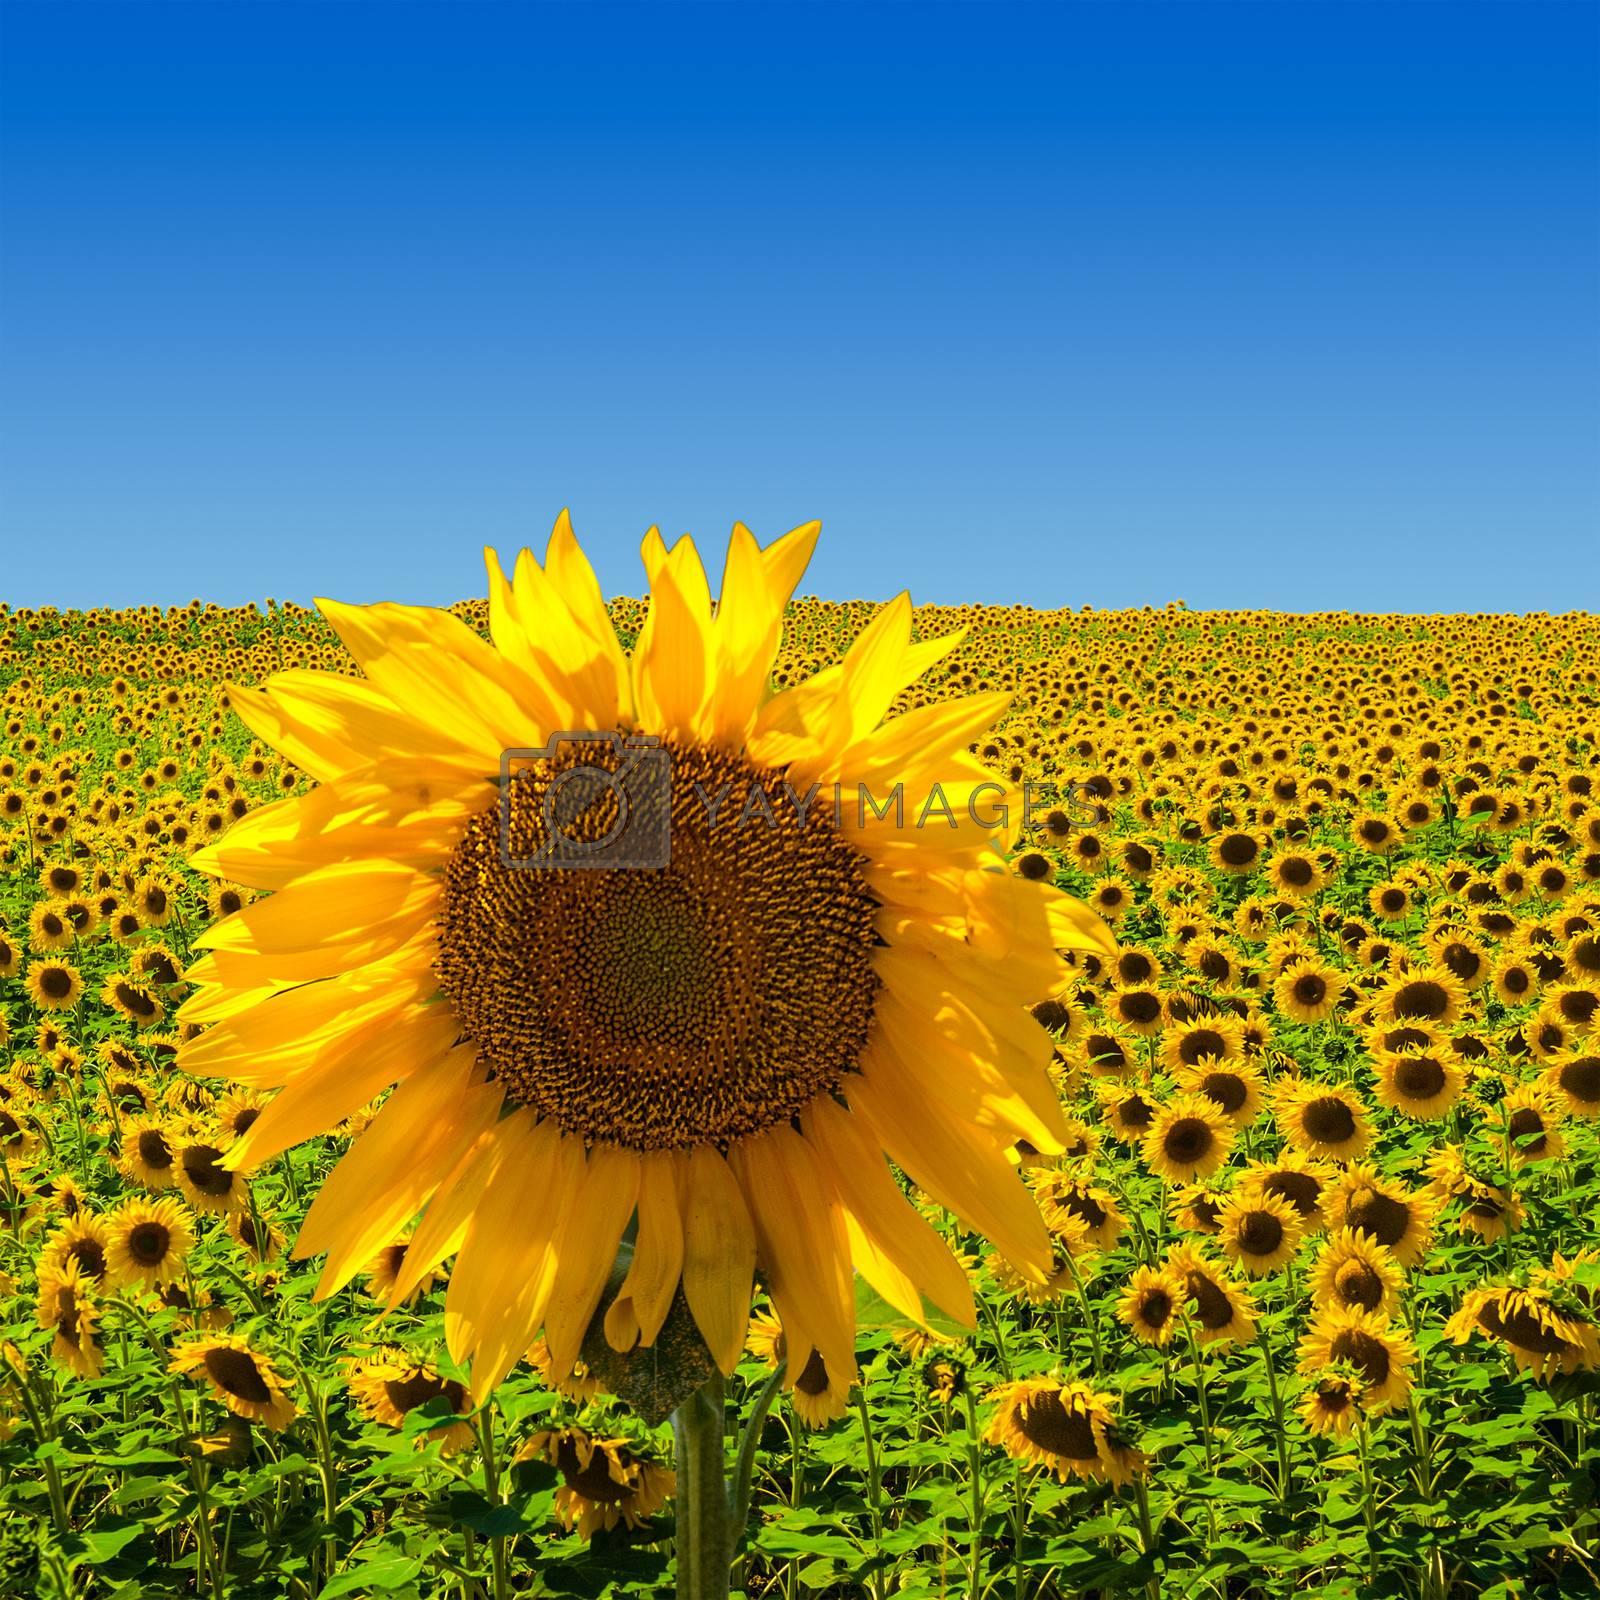 Big Sunflower on Sunflower Field by ajn